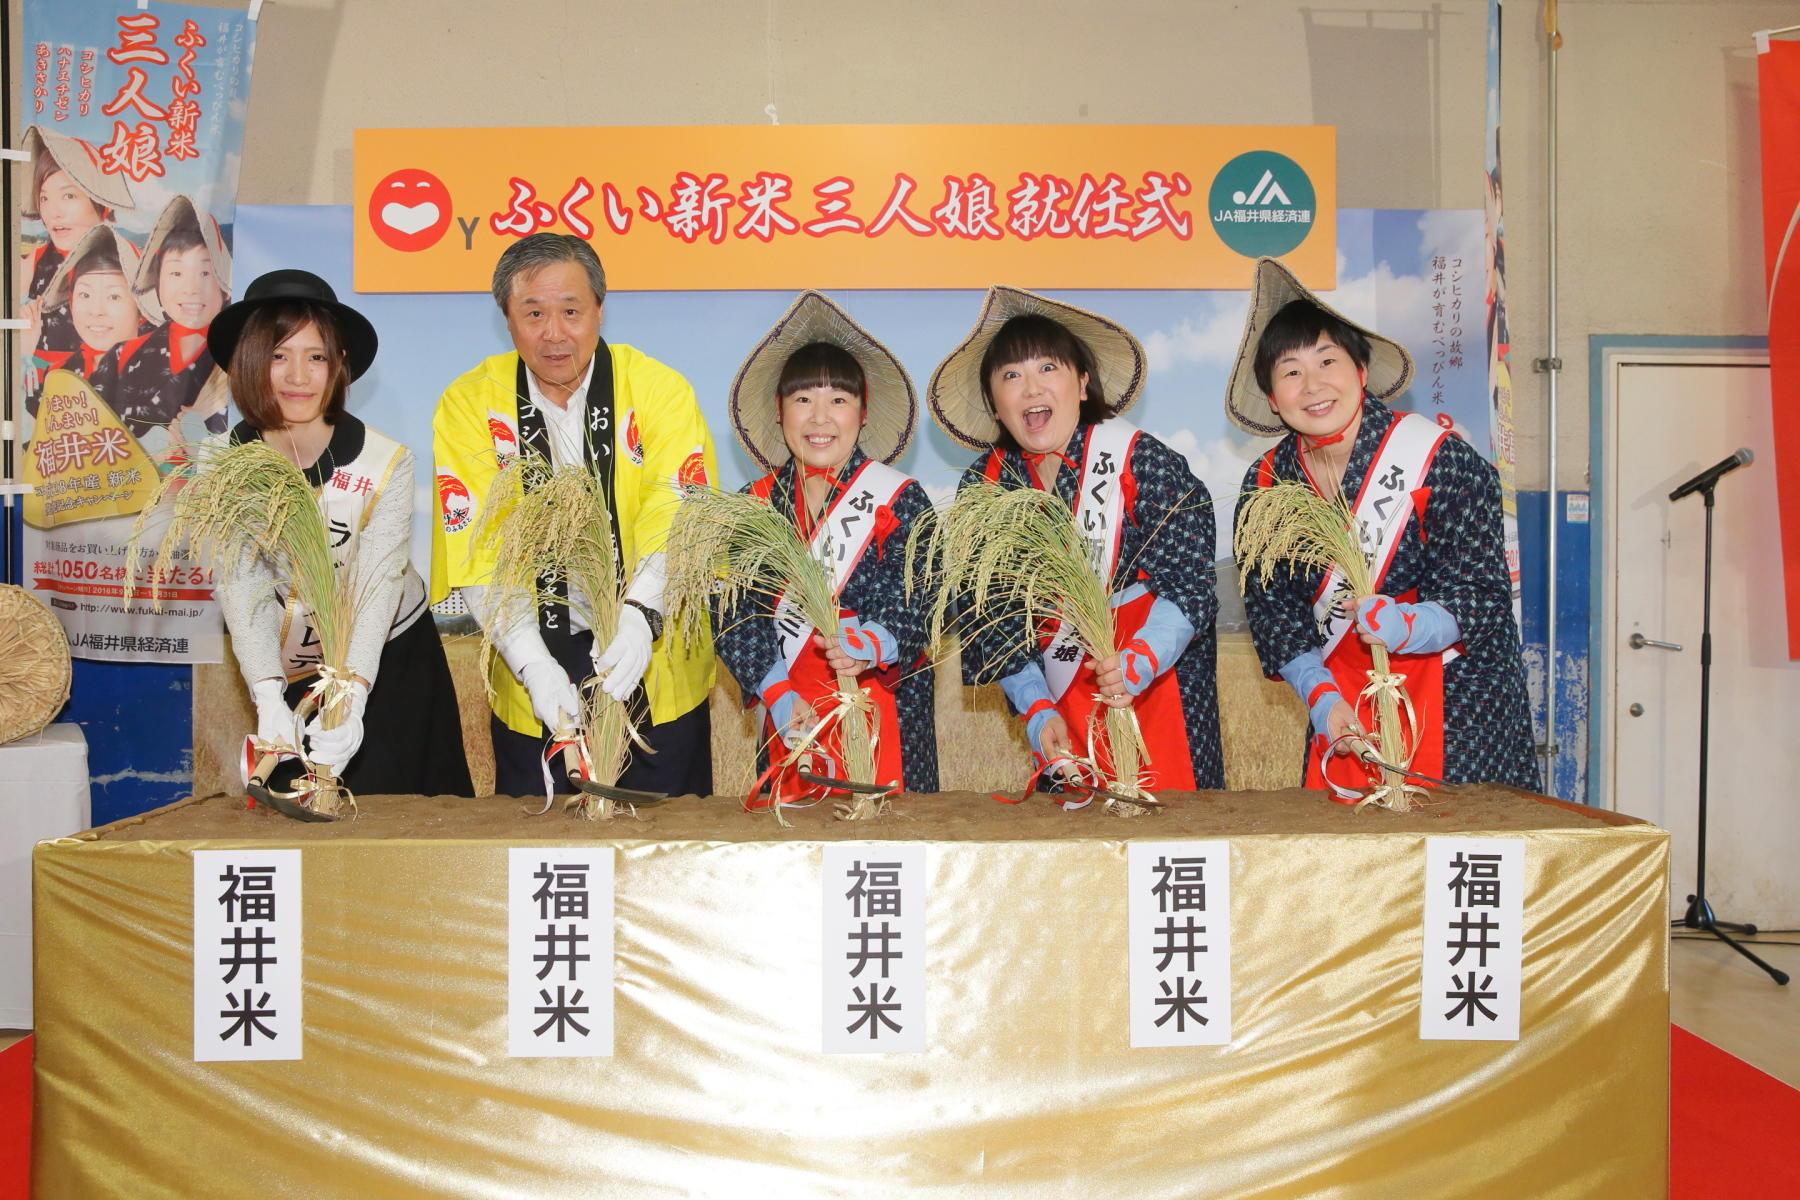 http://news.yoshimoto.co.jp/20160831143921-e7c2cc0f64b084f993fd83f02f322fc61a5ee464.jpg